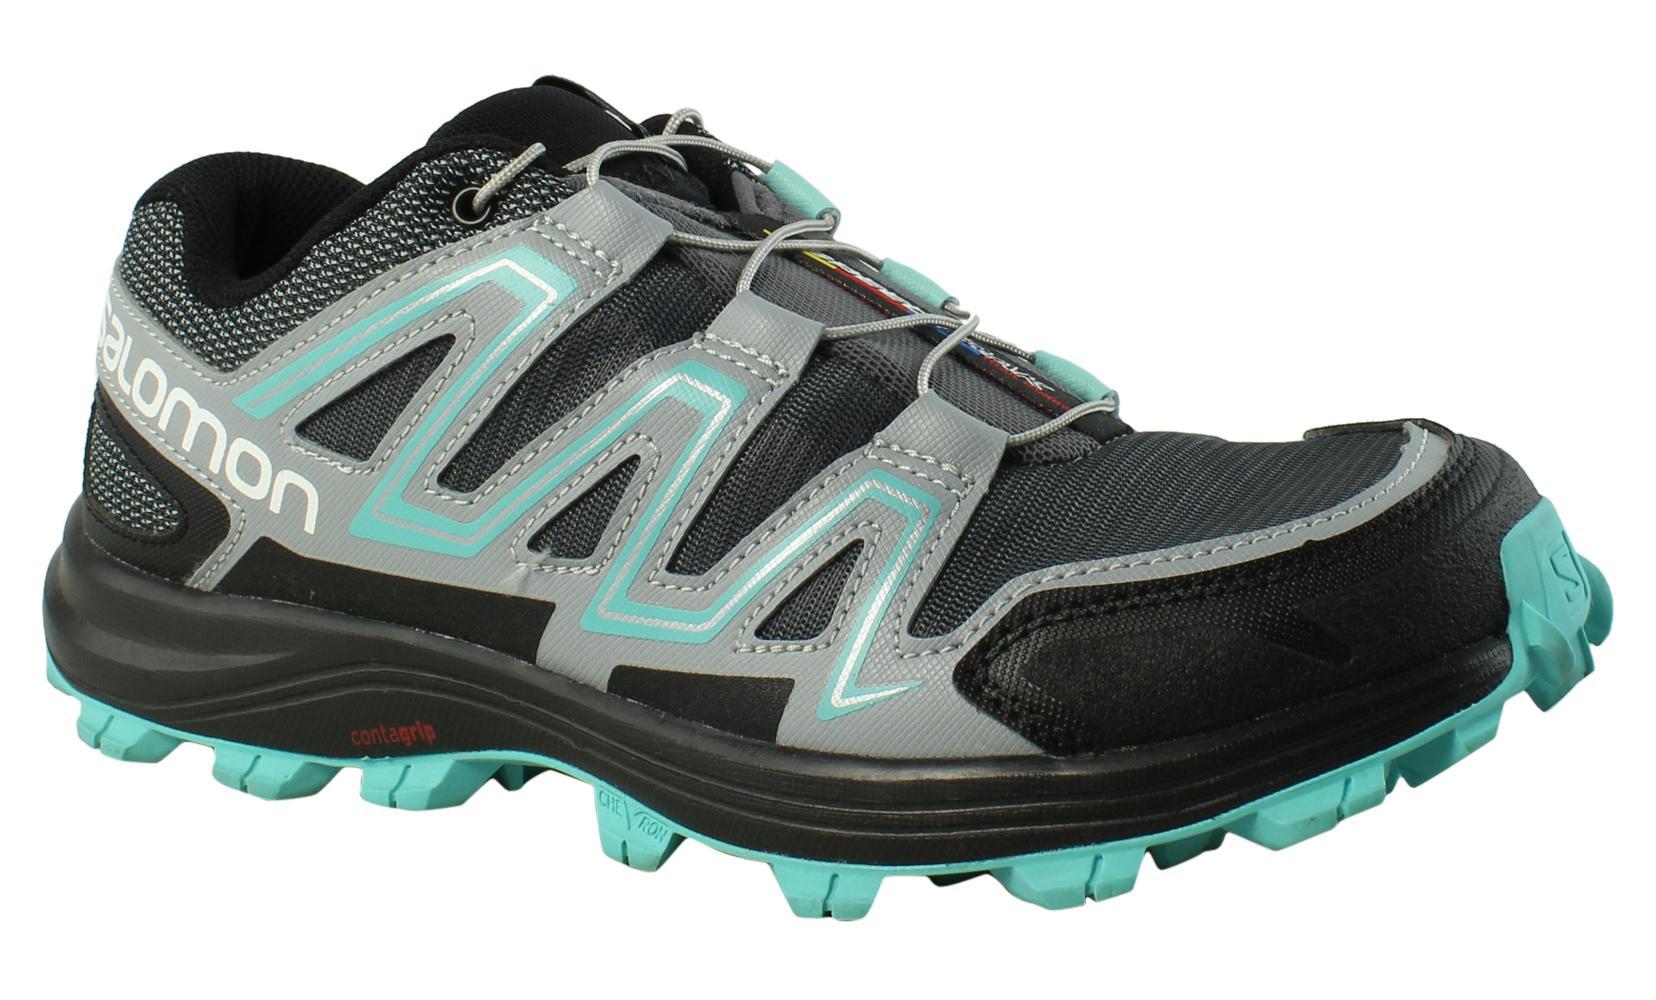 Salomon femmes  Speedtrak W DarkCloud/LightOnix/Bubblebleu Trail / Hiking  Chaussures